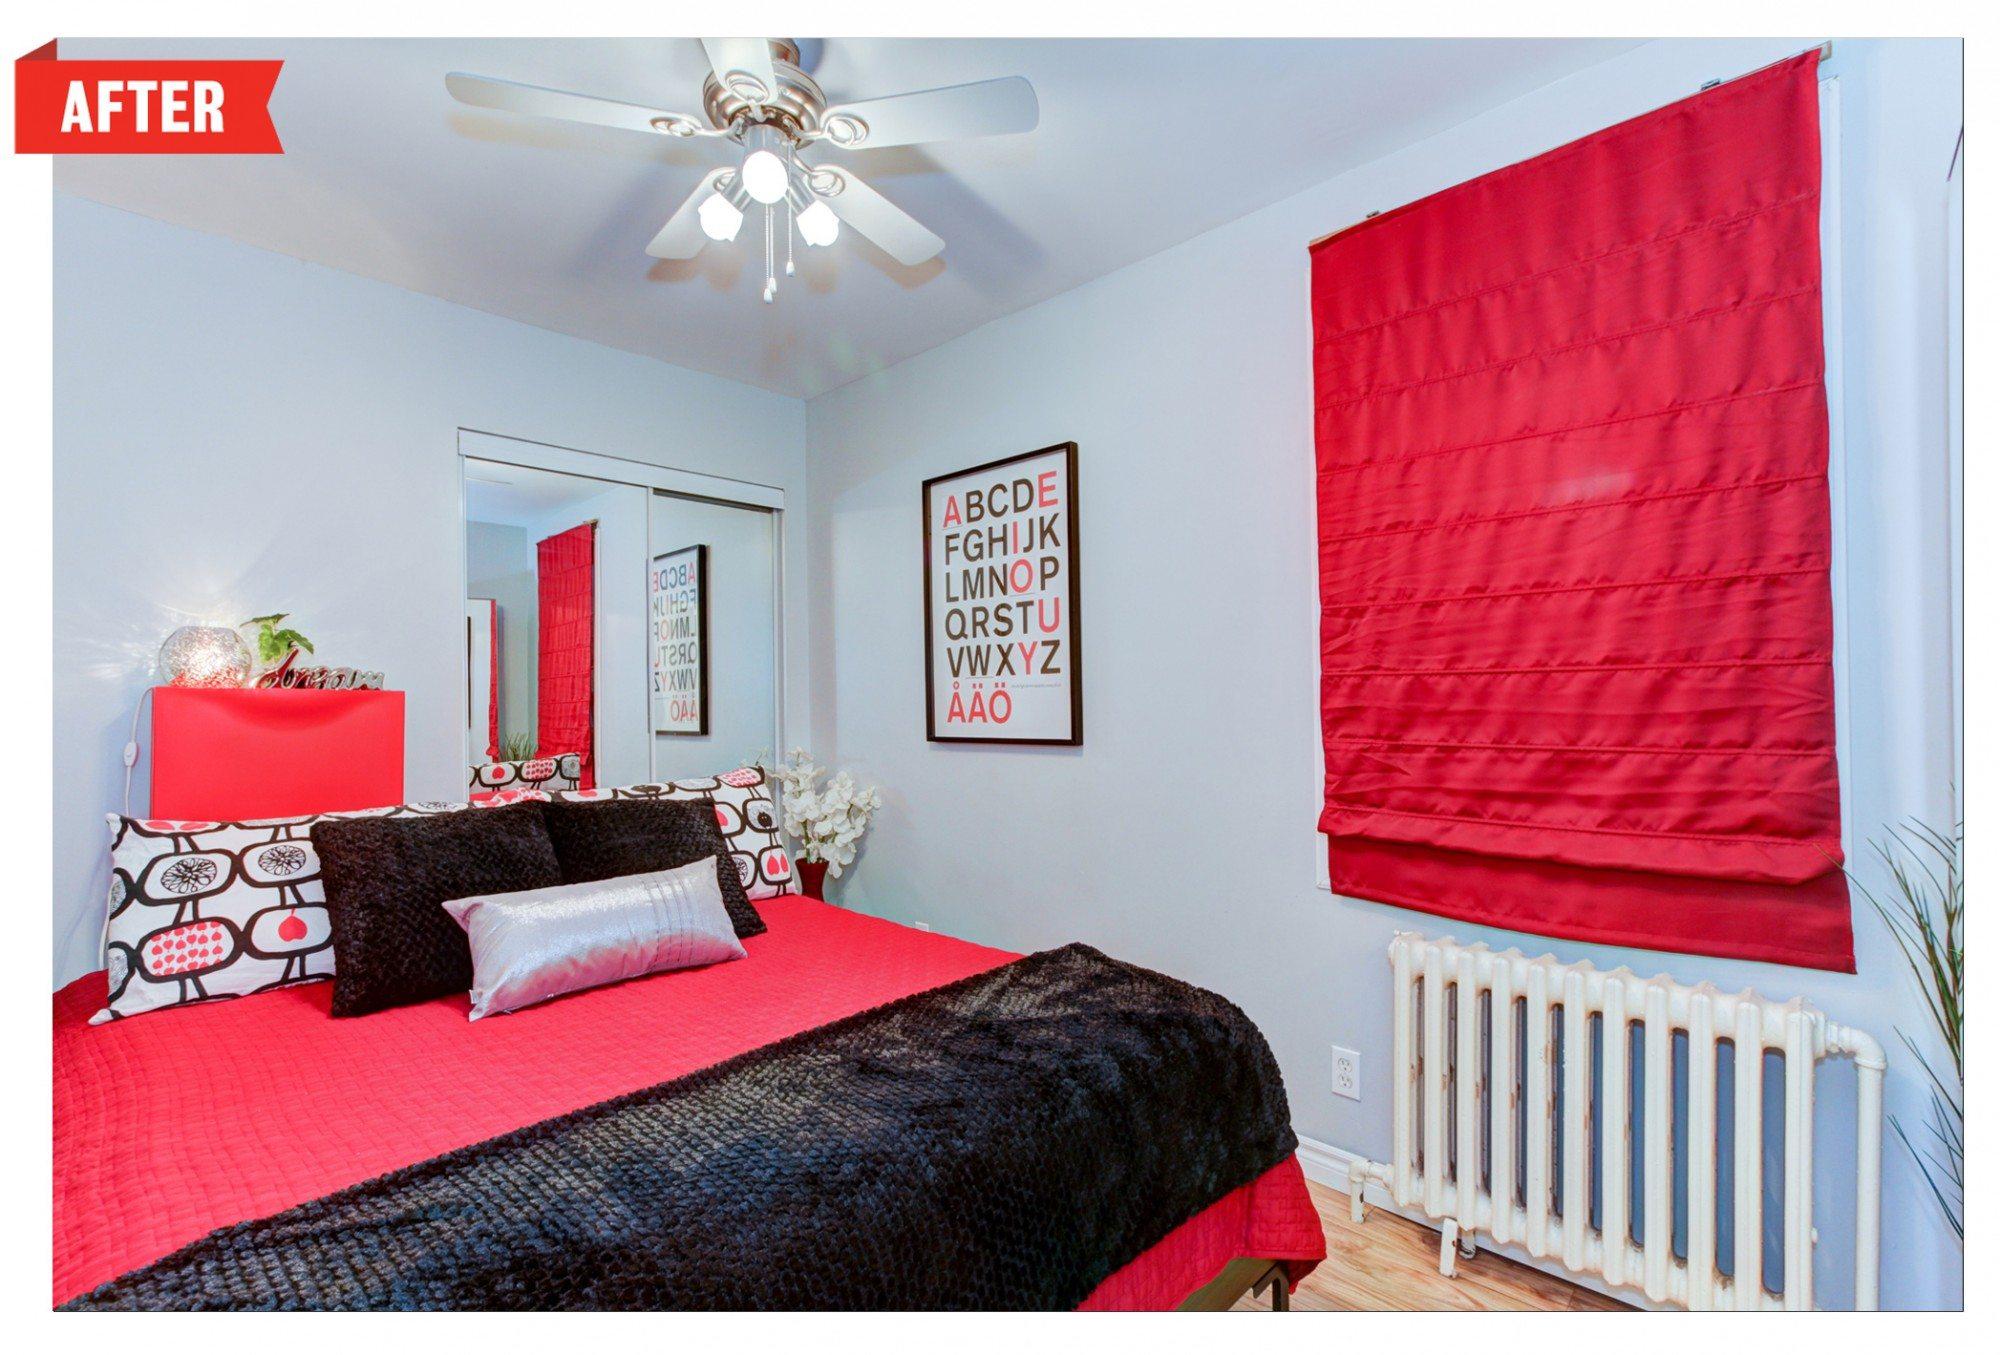 toronto-house-staging-1959-dundas-street-east-bedroom-after